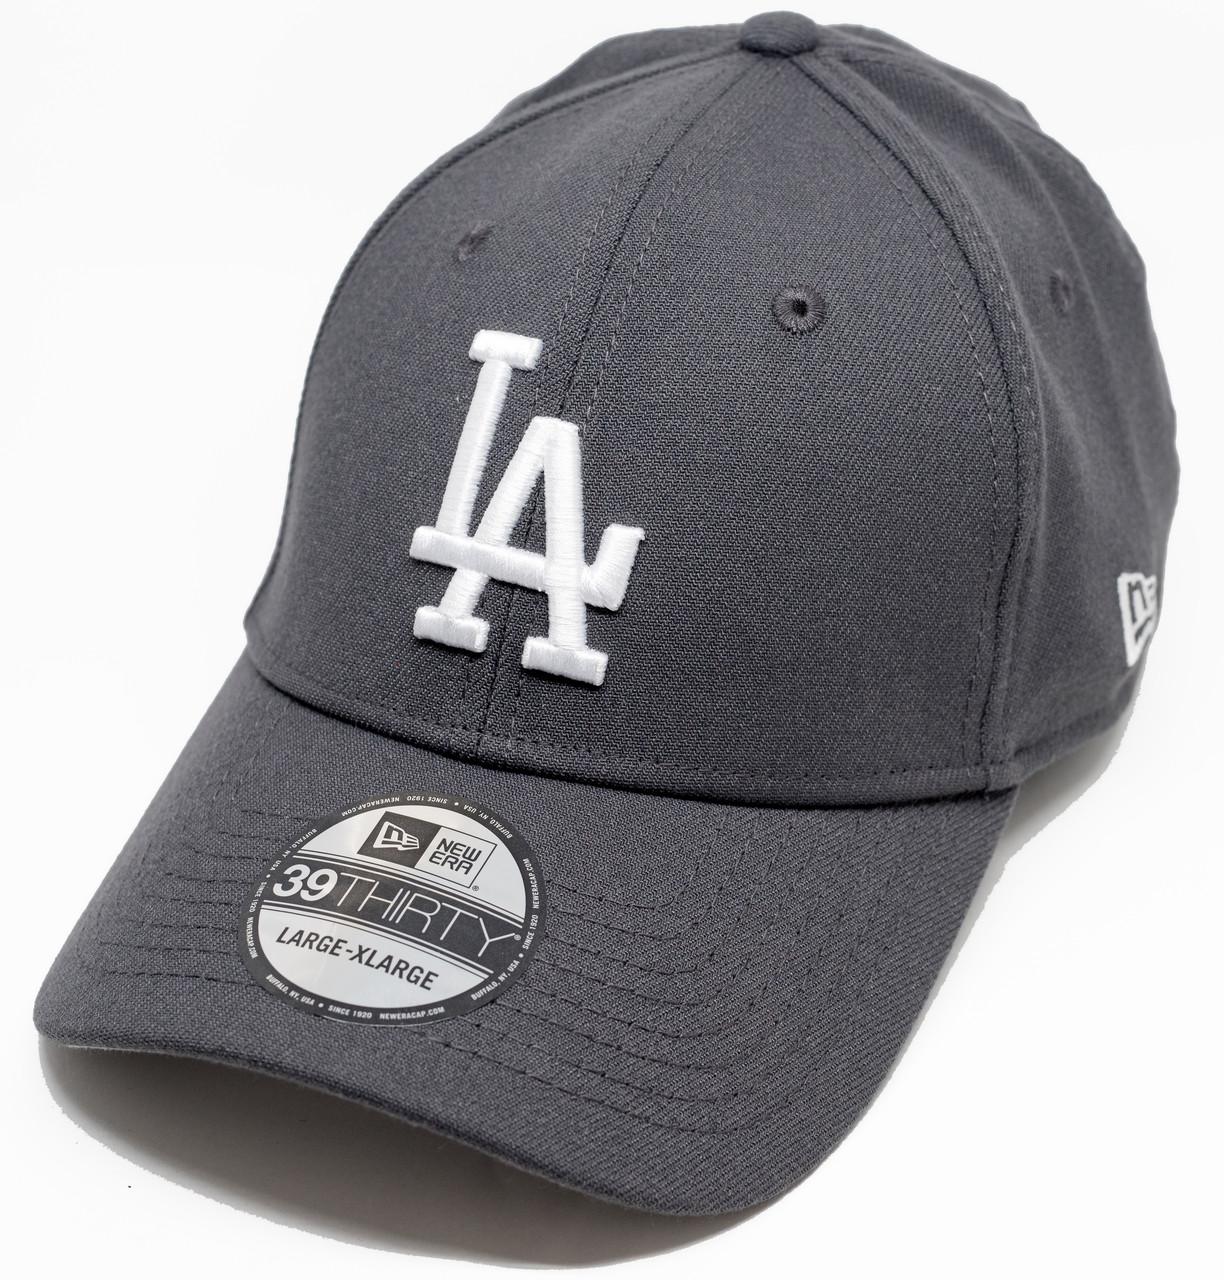 New Era 39Thirty Season Fit New Los Angeles Dodgers Cap Graphite ... 98ba950a3ddb